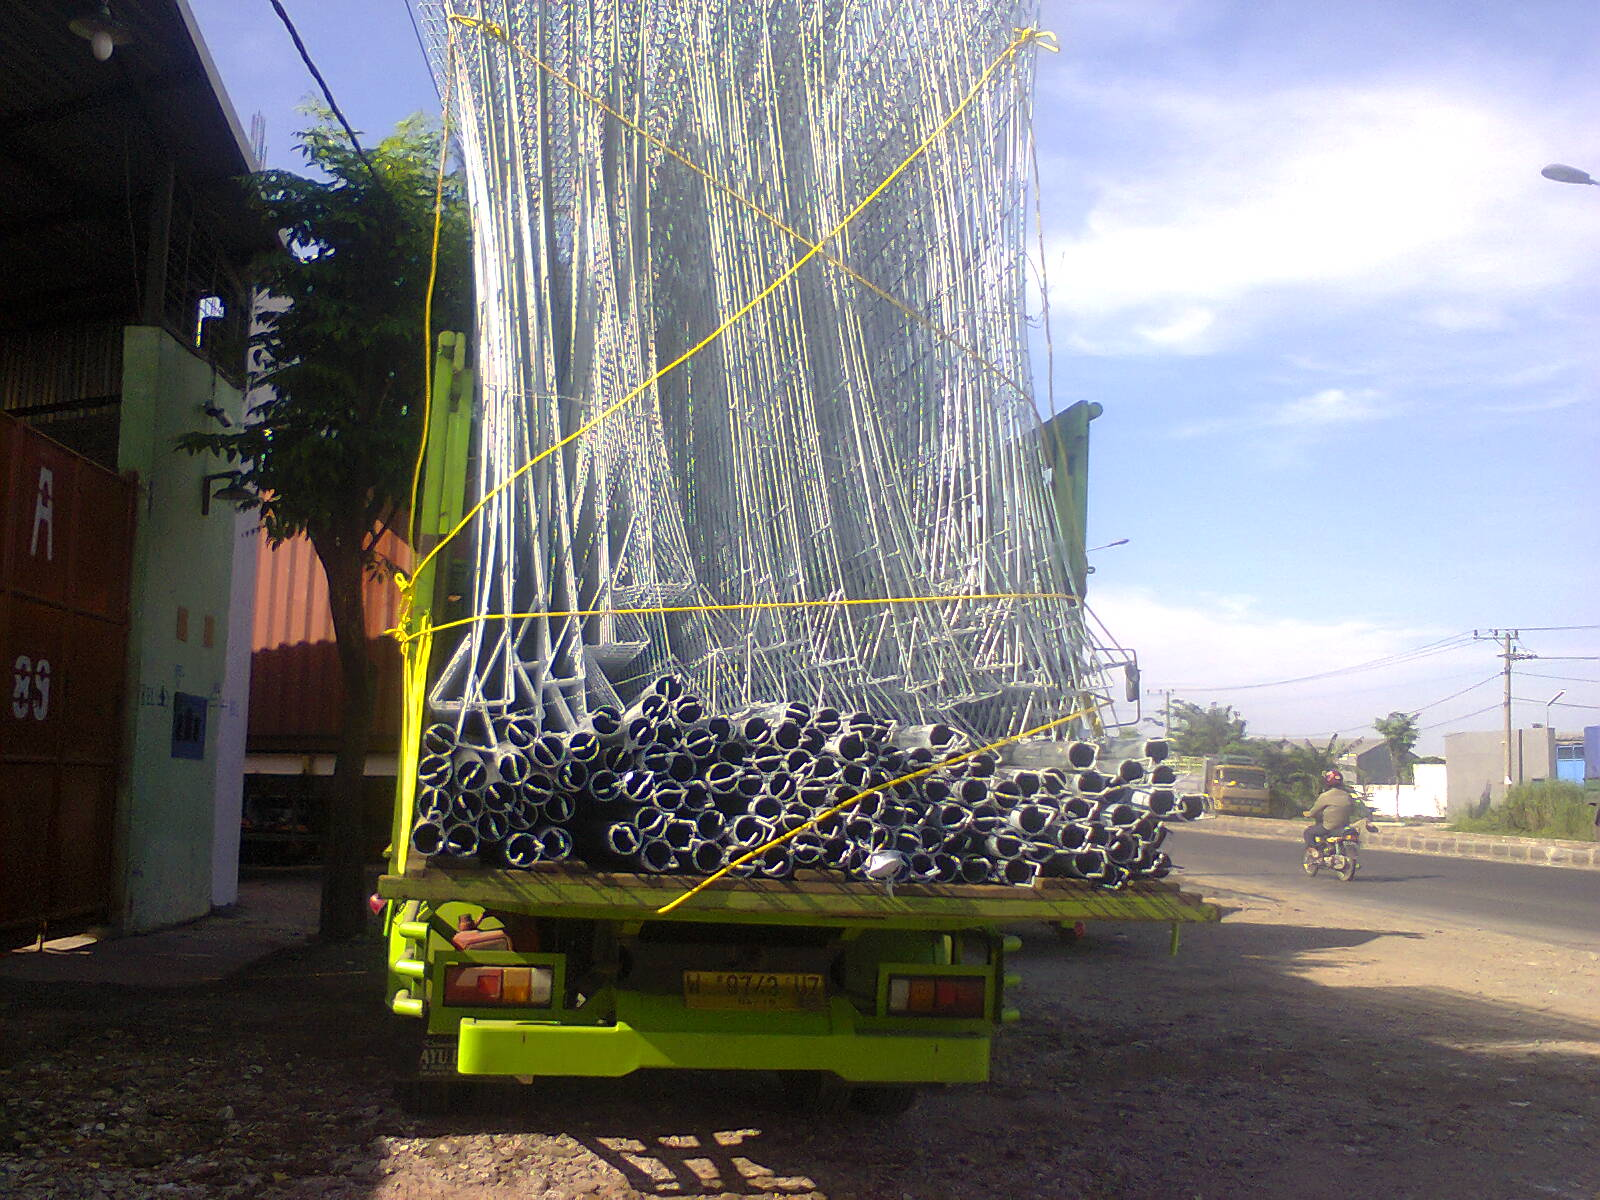 Jual Pagar Brc Daftar Harga Pagar Brc Pagar Brc Surabaya